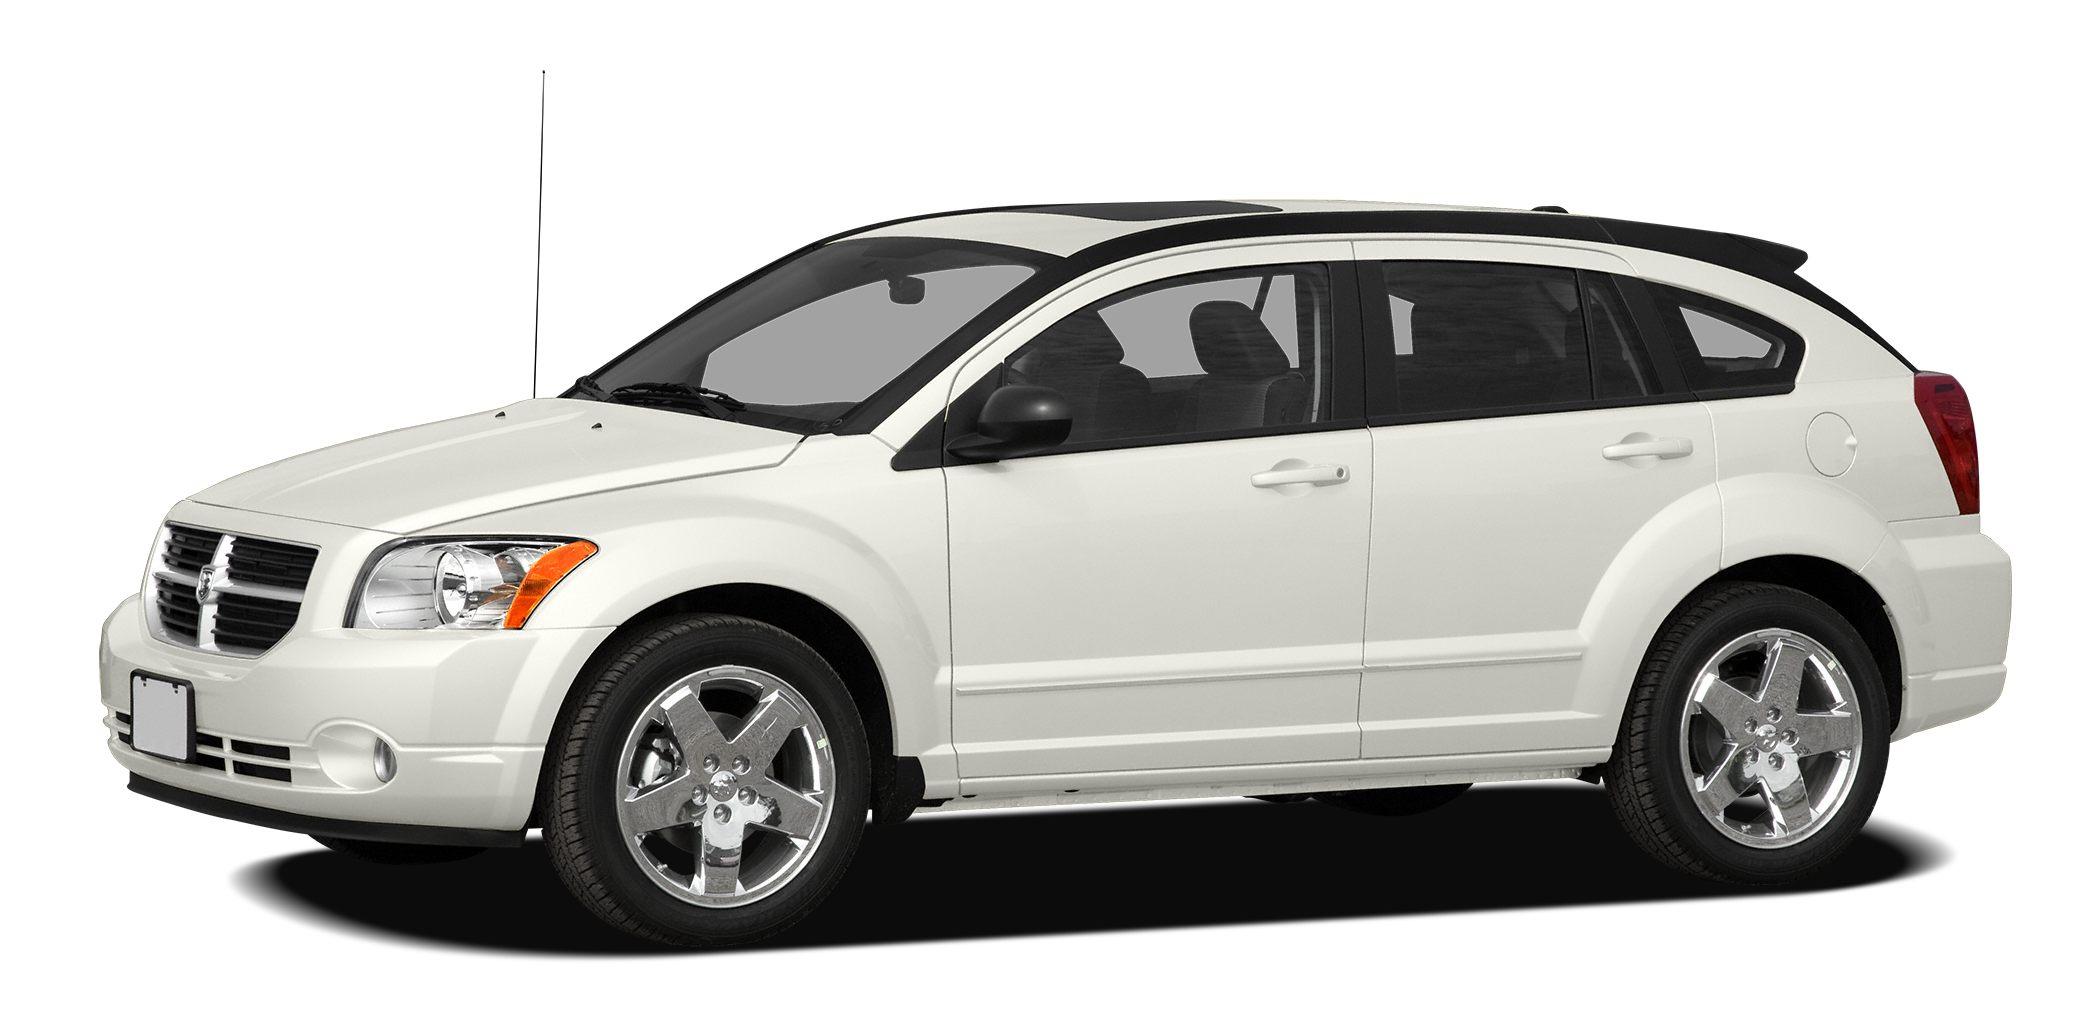 2010 Dodge Caliber Mainstreet Miles 58345Color White Stock 16923 VIN 1B3CB3HA0AD568007